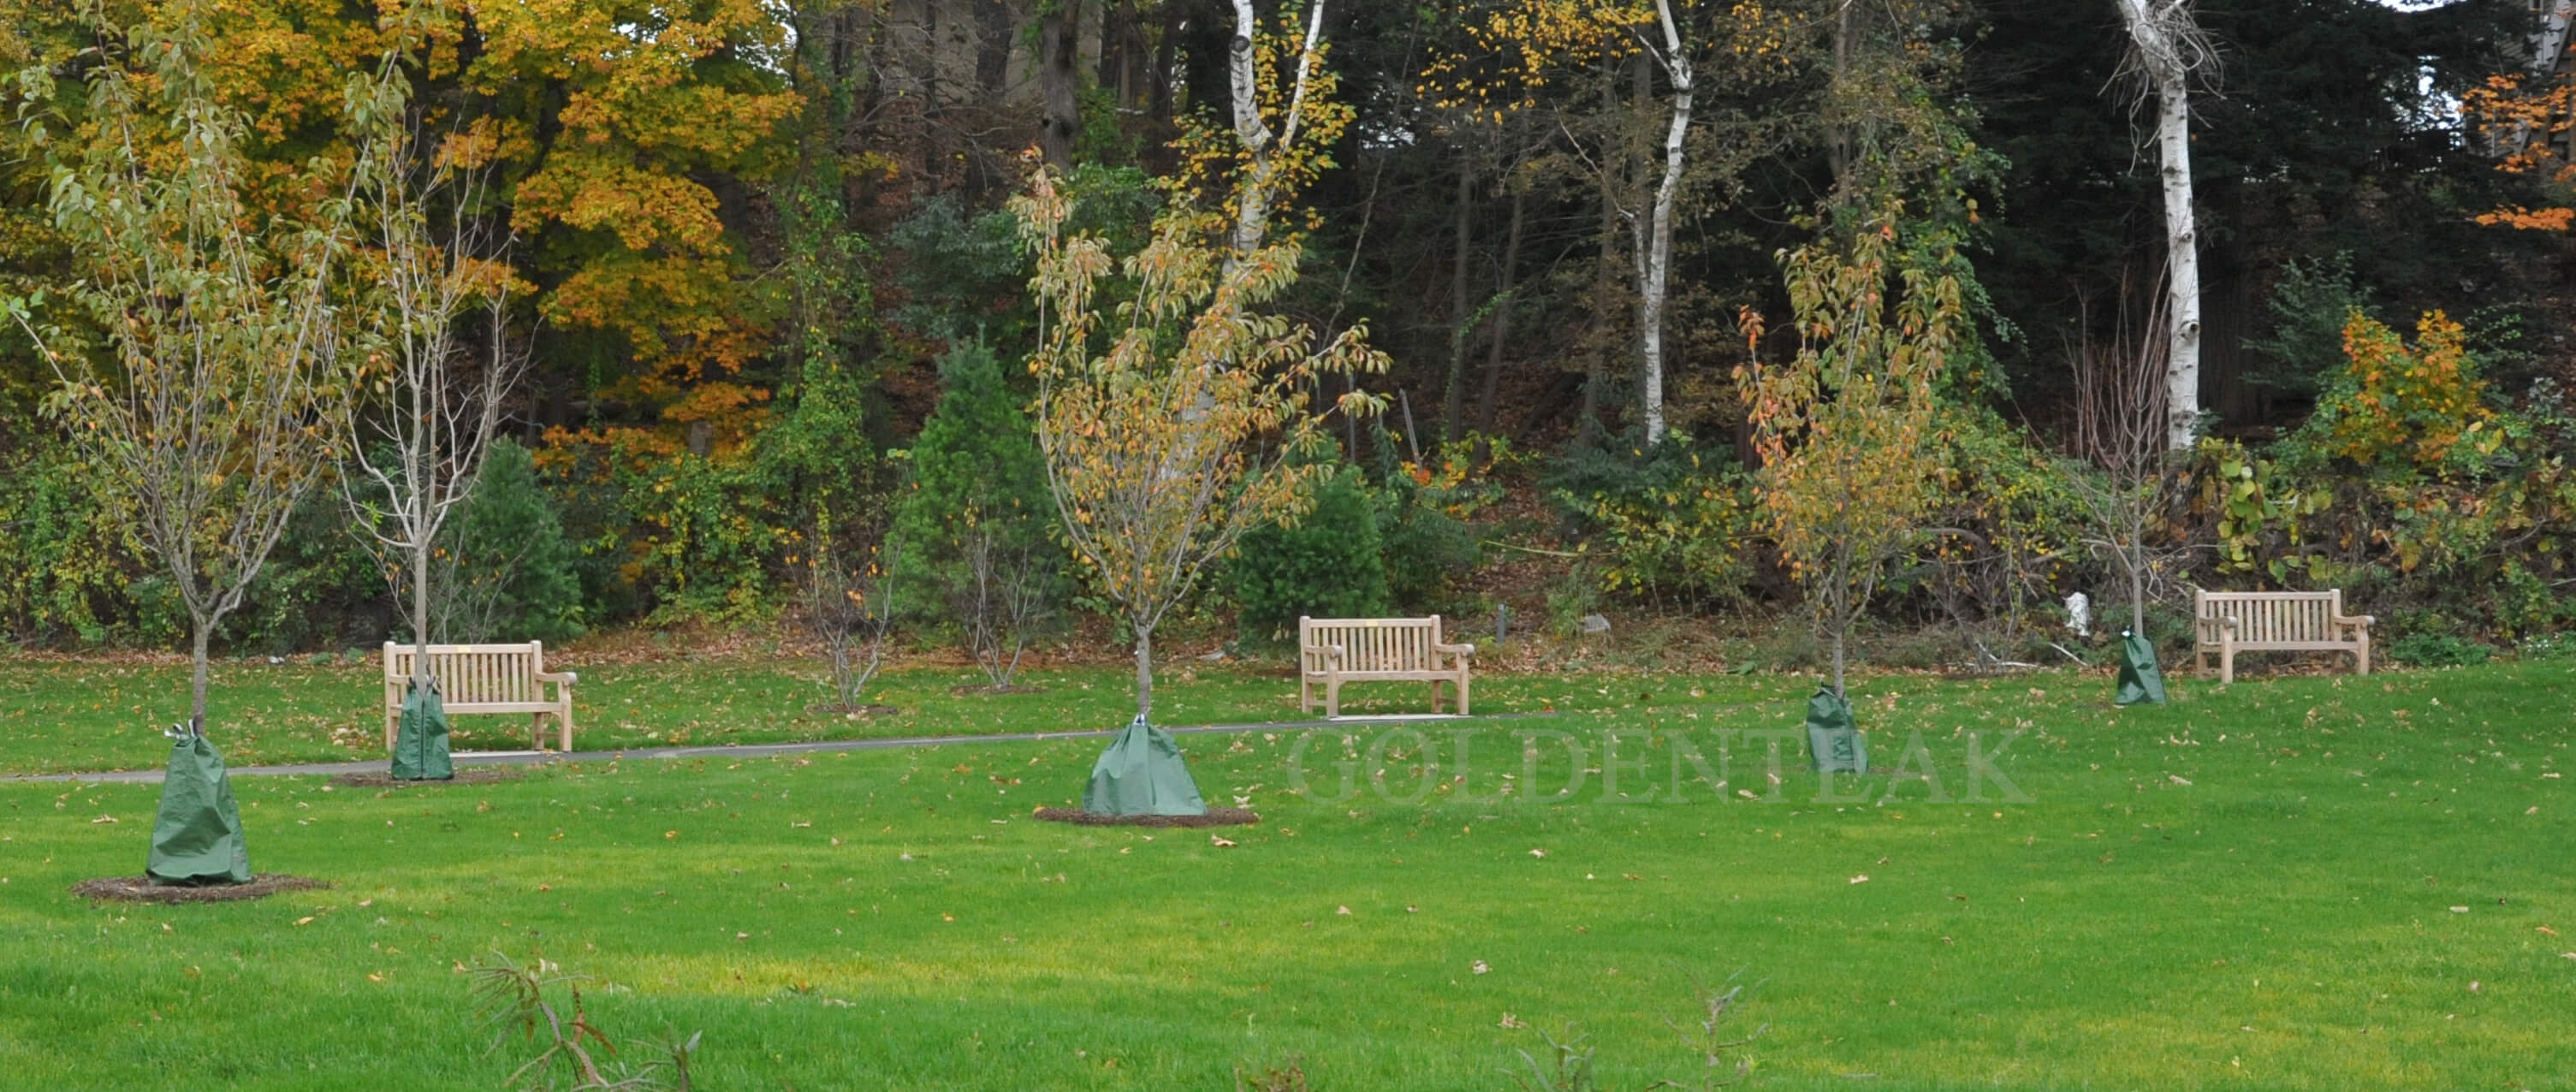 Goldenteak Teak Outdoor Furniture Institutional Sales